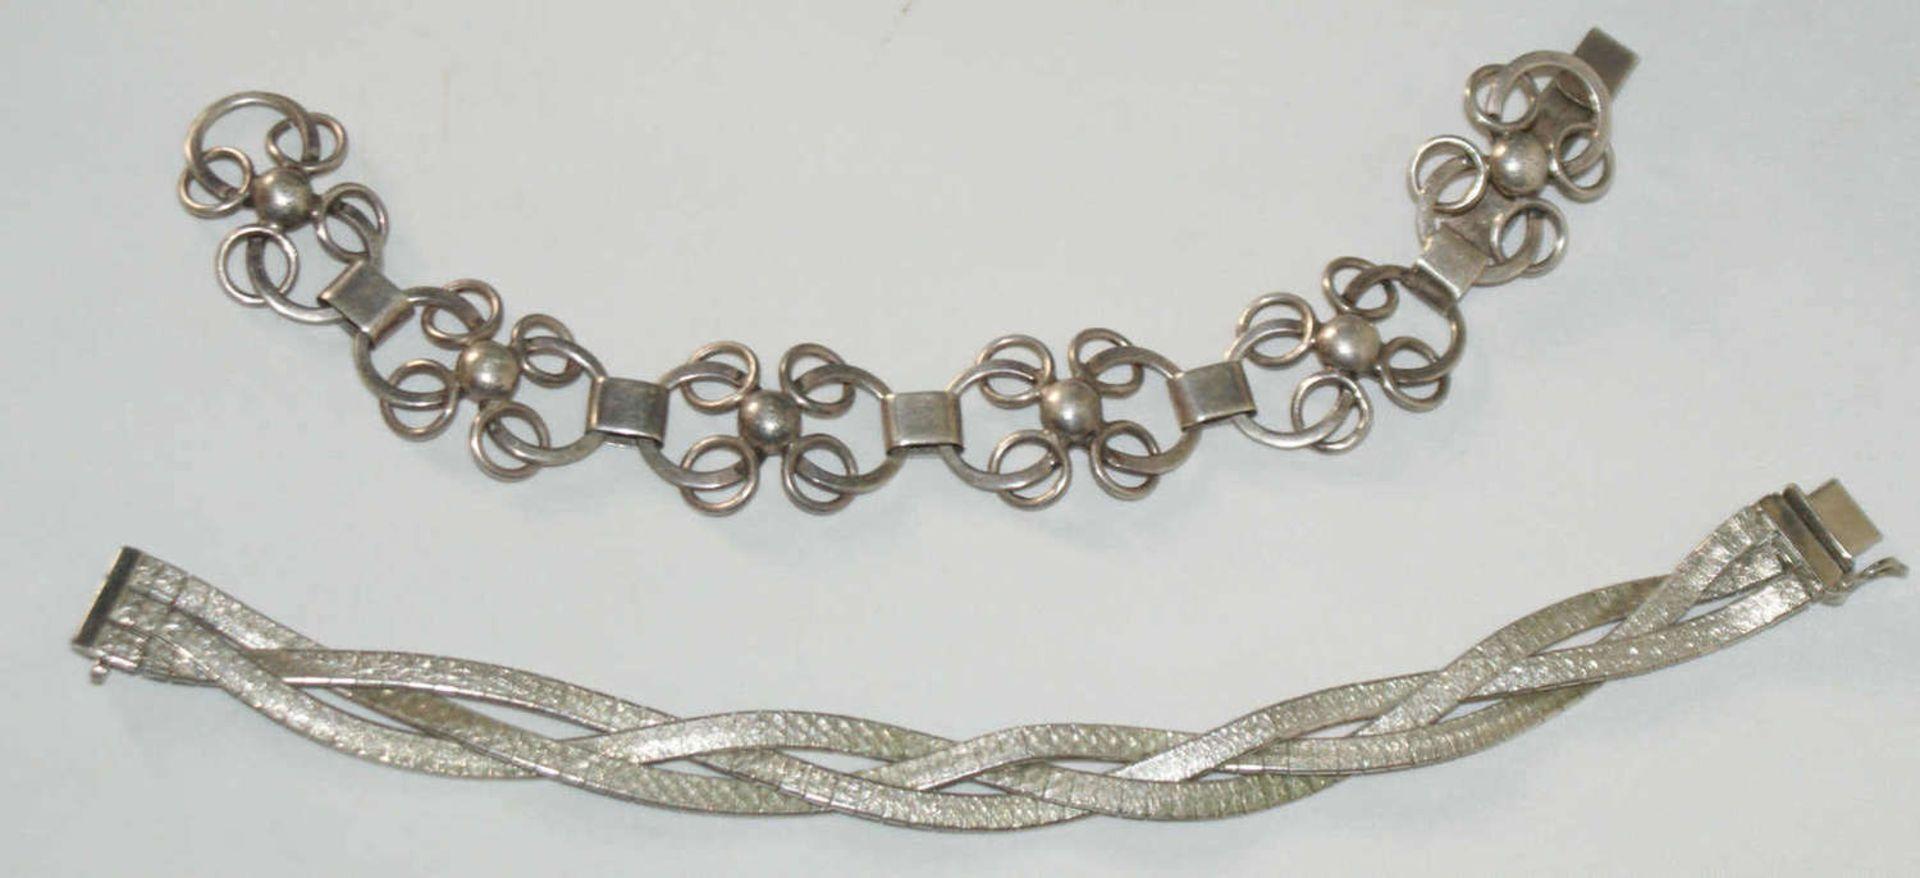 2 Armbänder, Silber, 1x 835er Silber, sowie 830er Silber. 1x alte Handarbeit. Gewicht ca. 52 gr